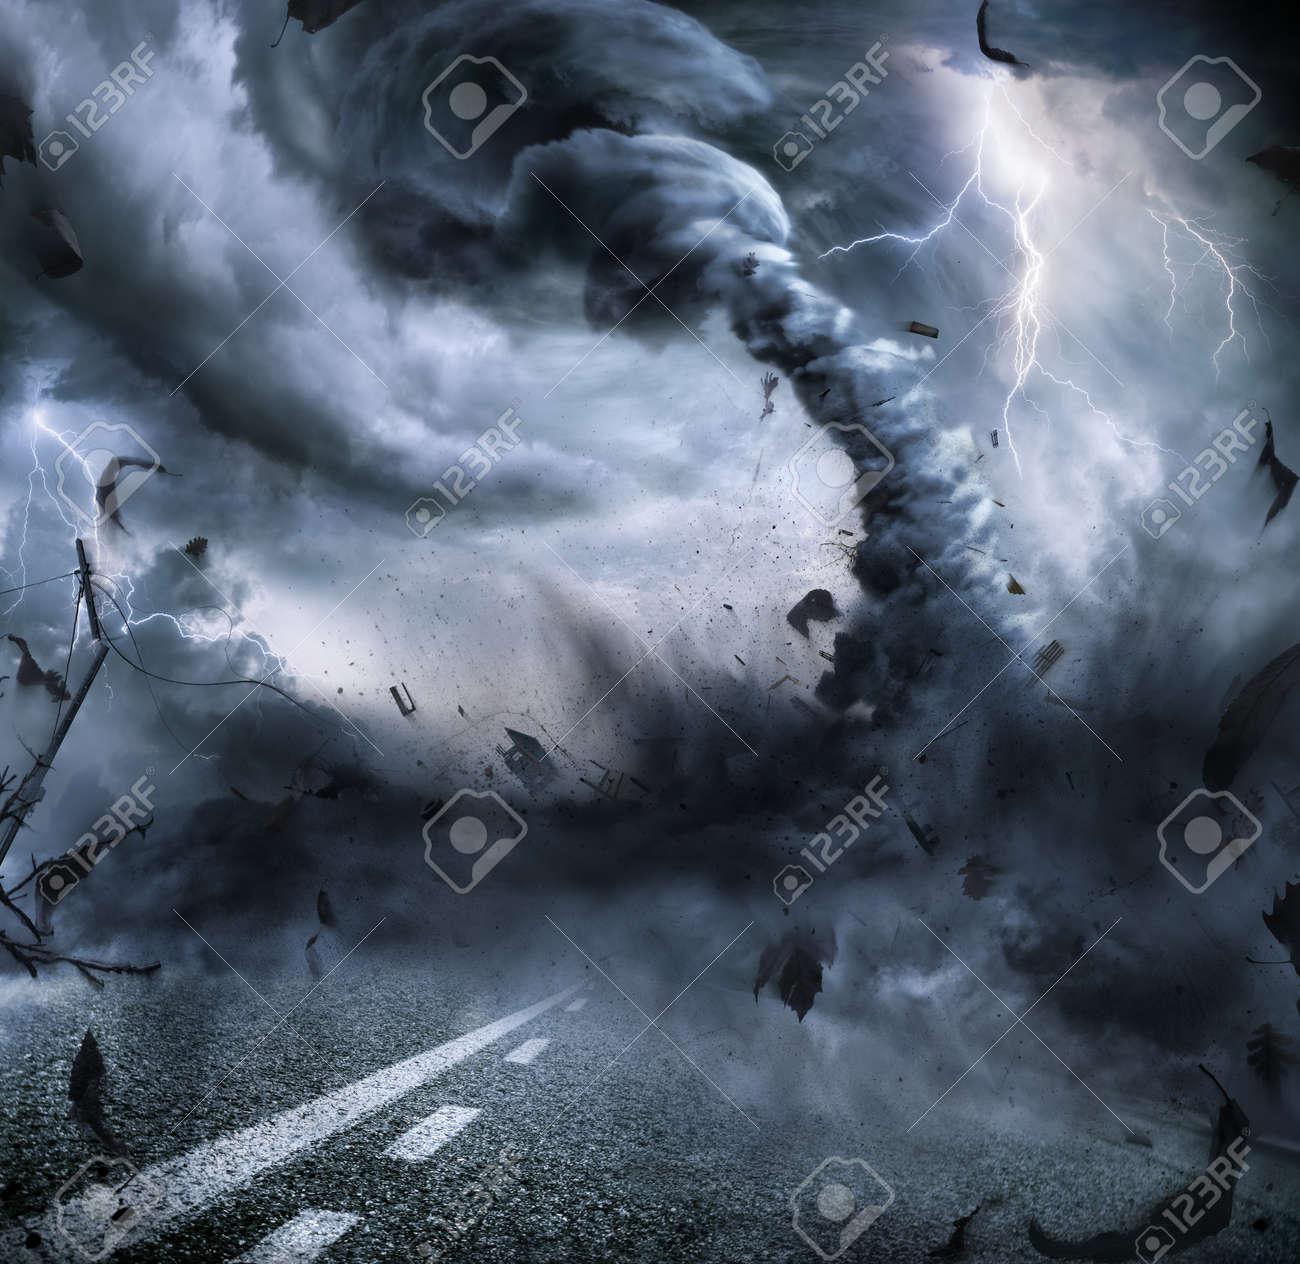 Powerful Tornado - Dramatic Destruction On The Road - 45711863